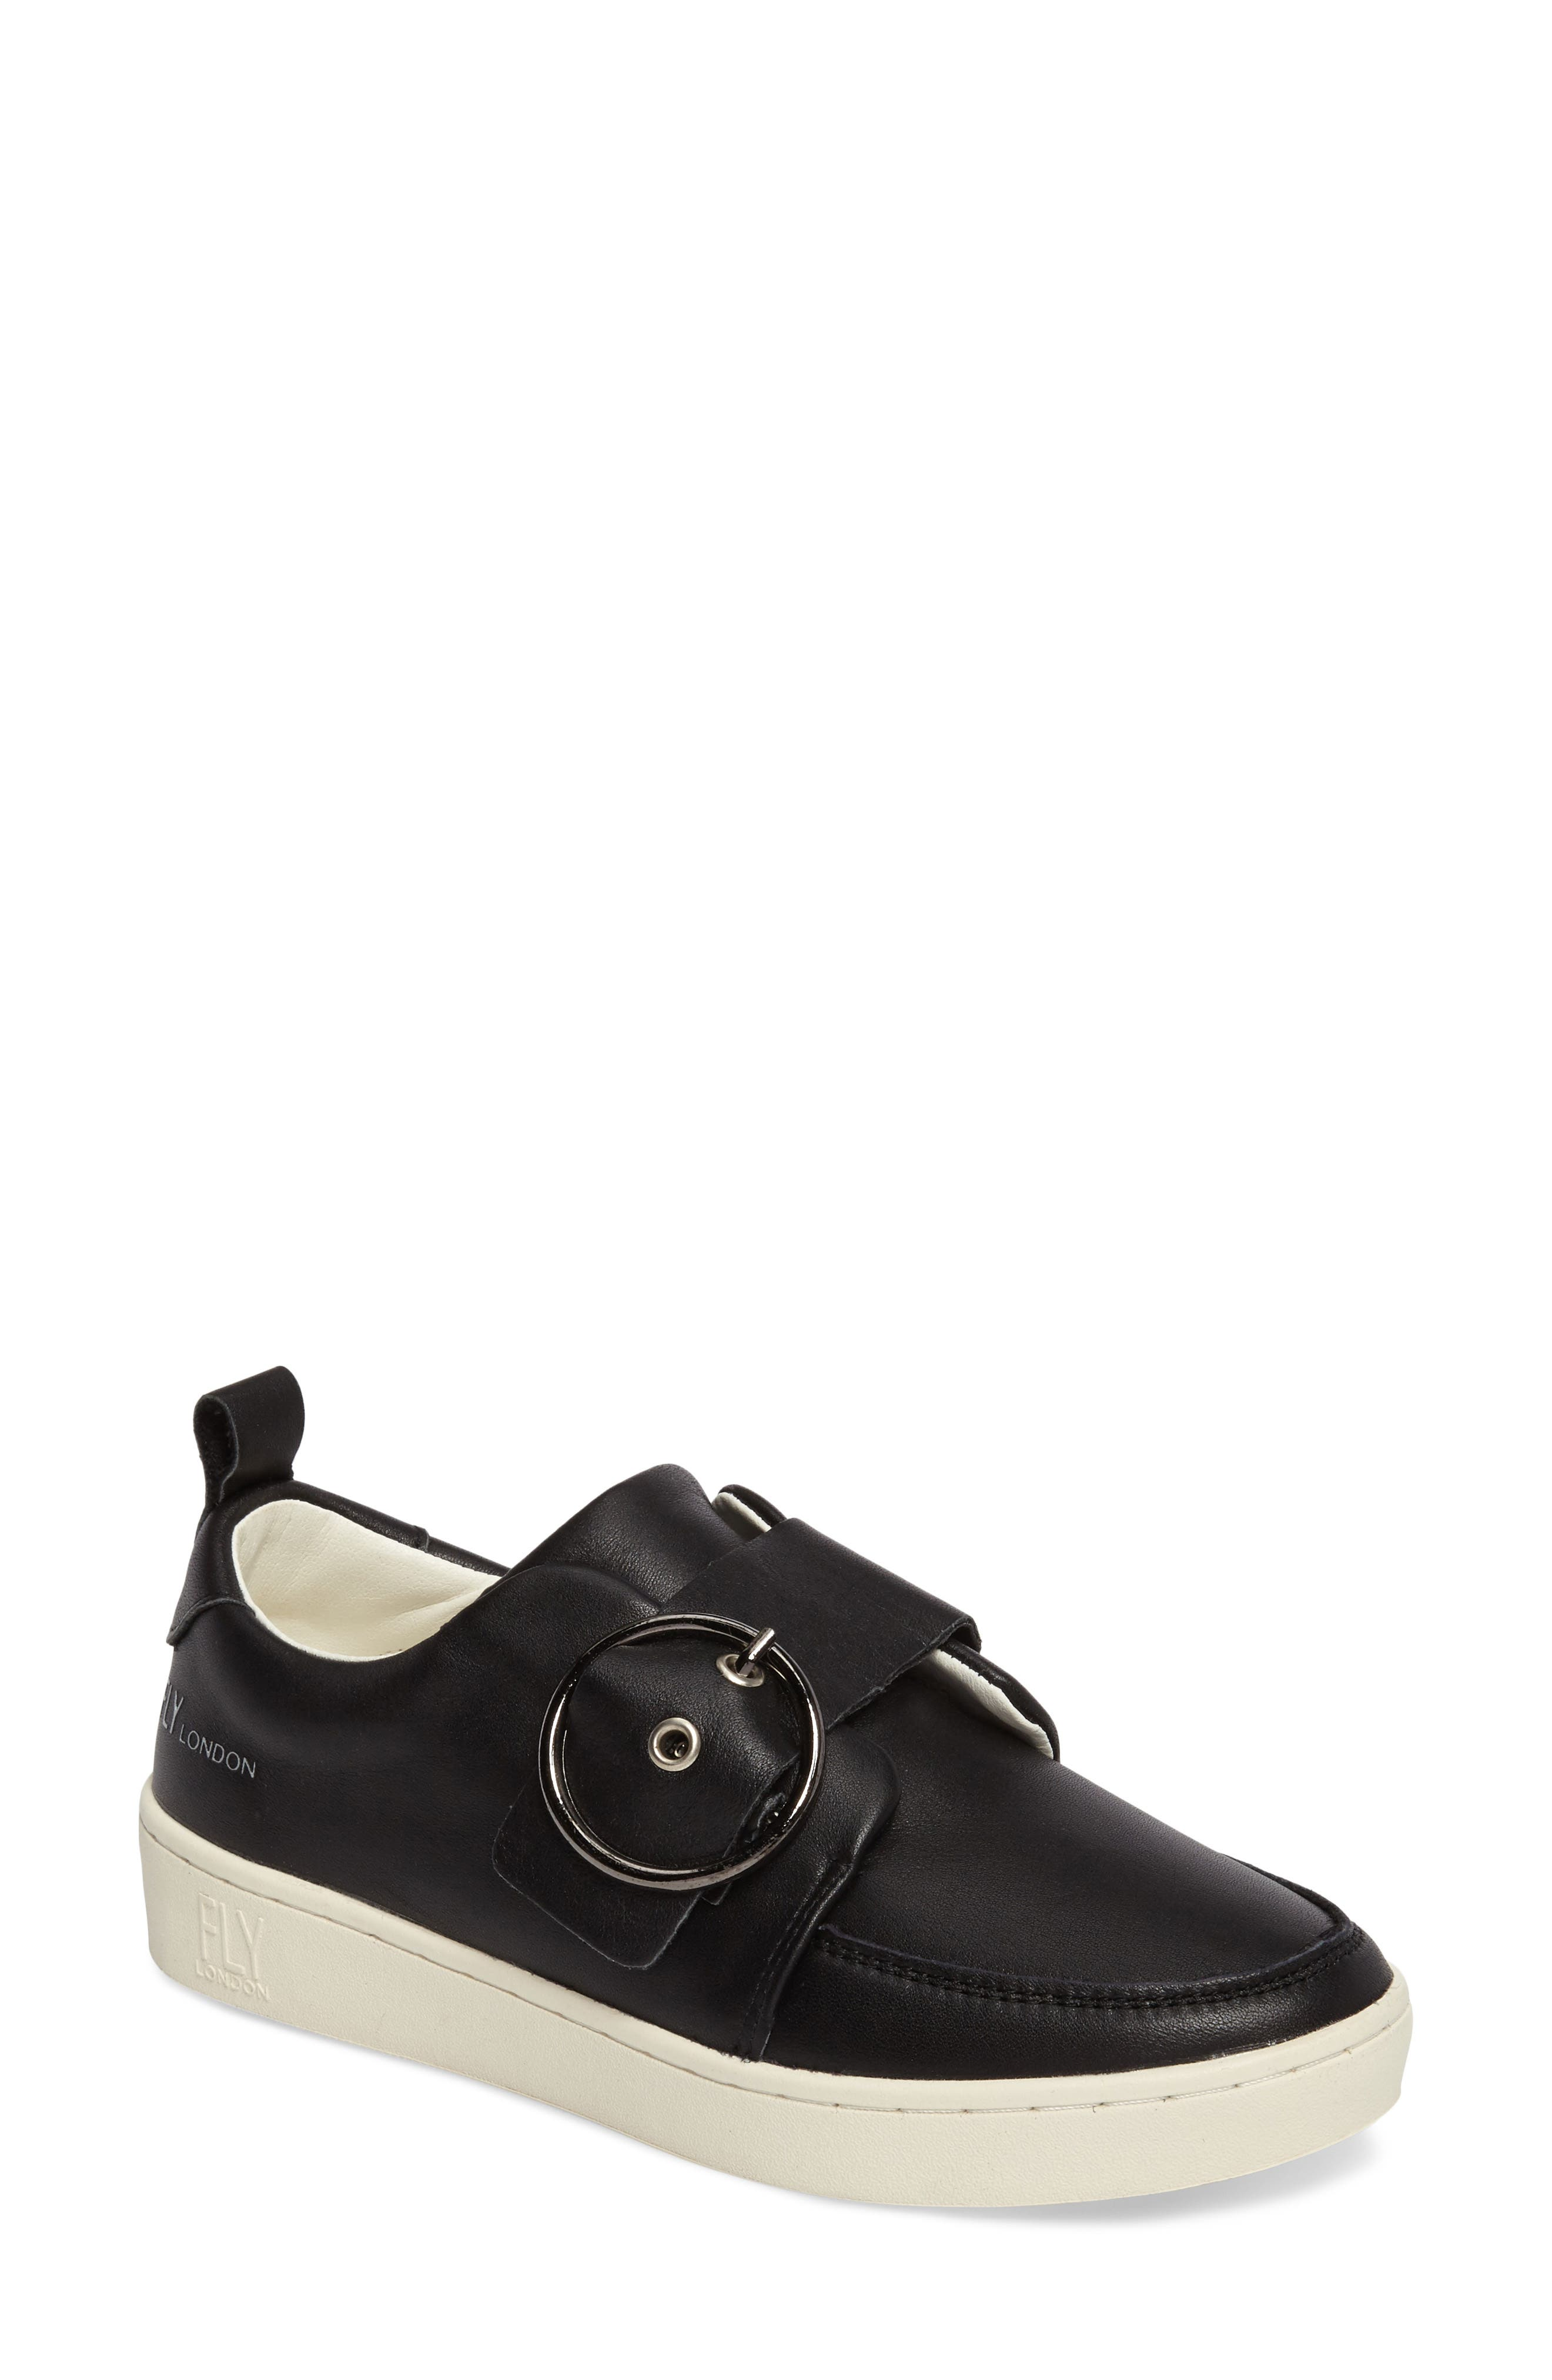 Alternate Image 1 Selected - Fly London Mice Buckle Sneaker (Women)